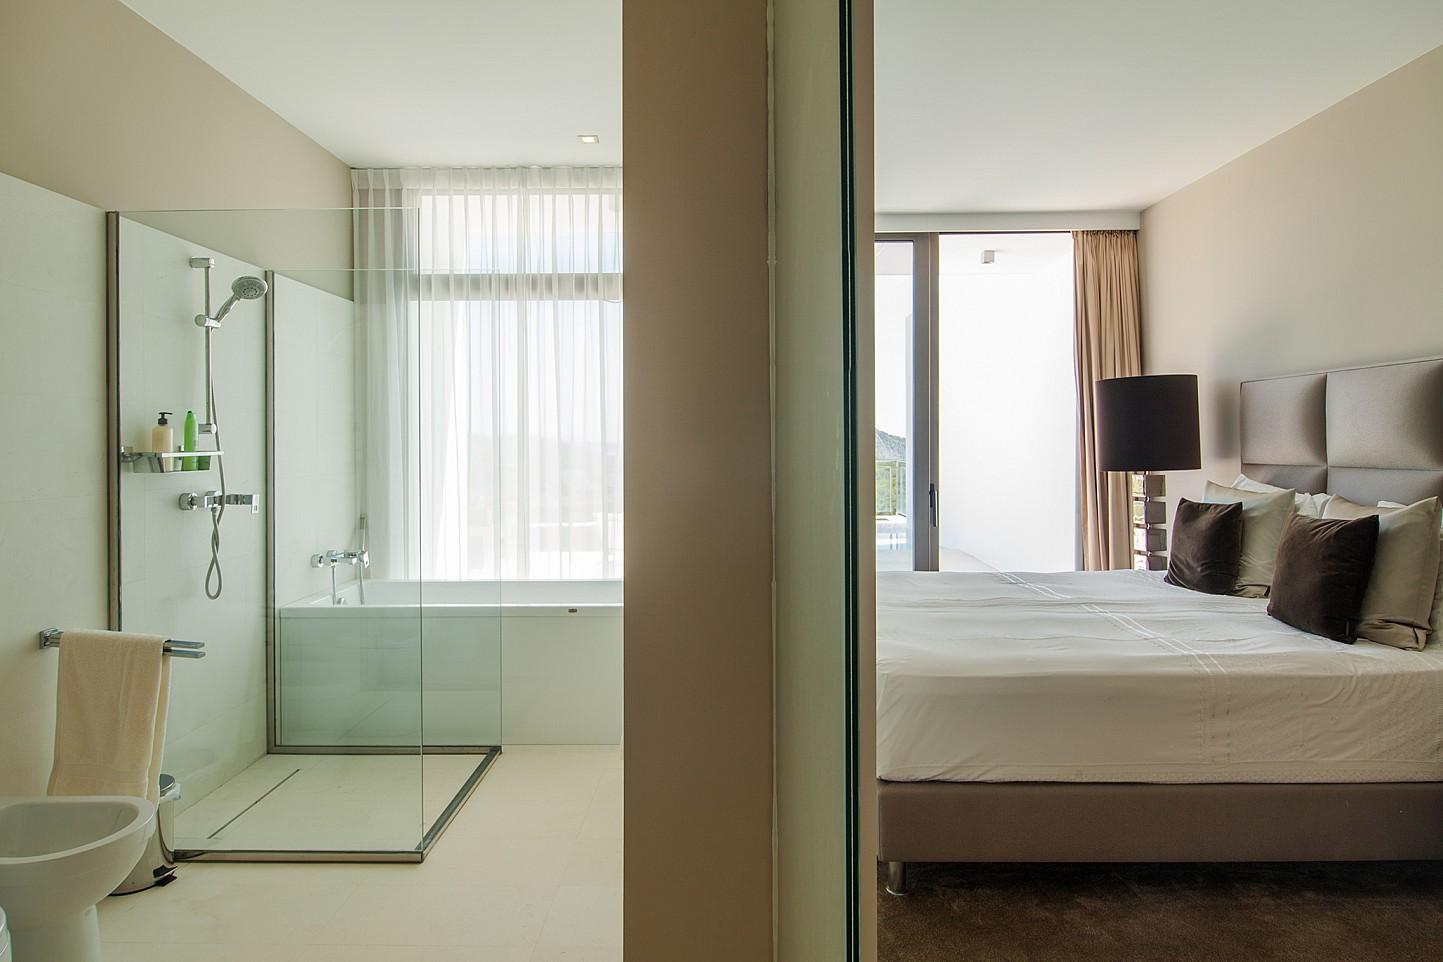 Dormitorio con baño completo